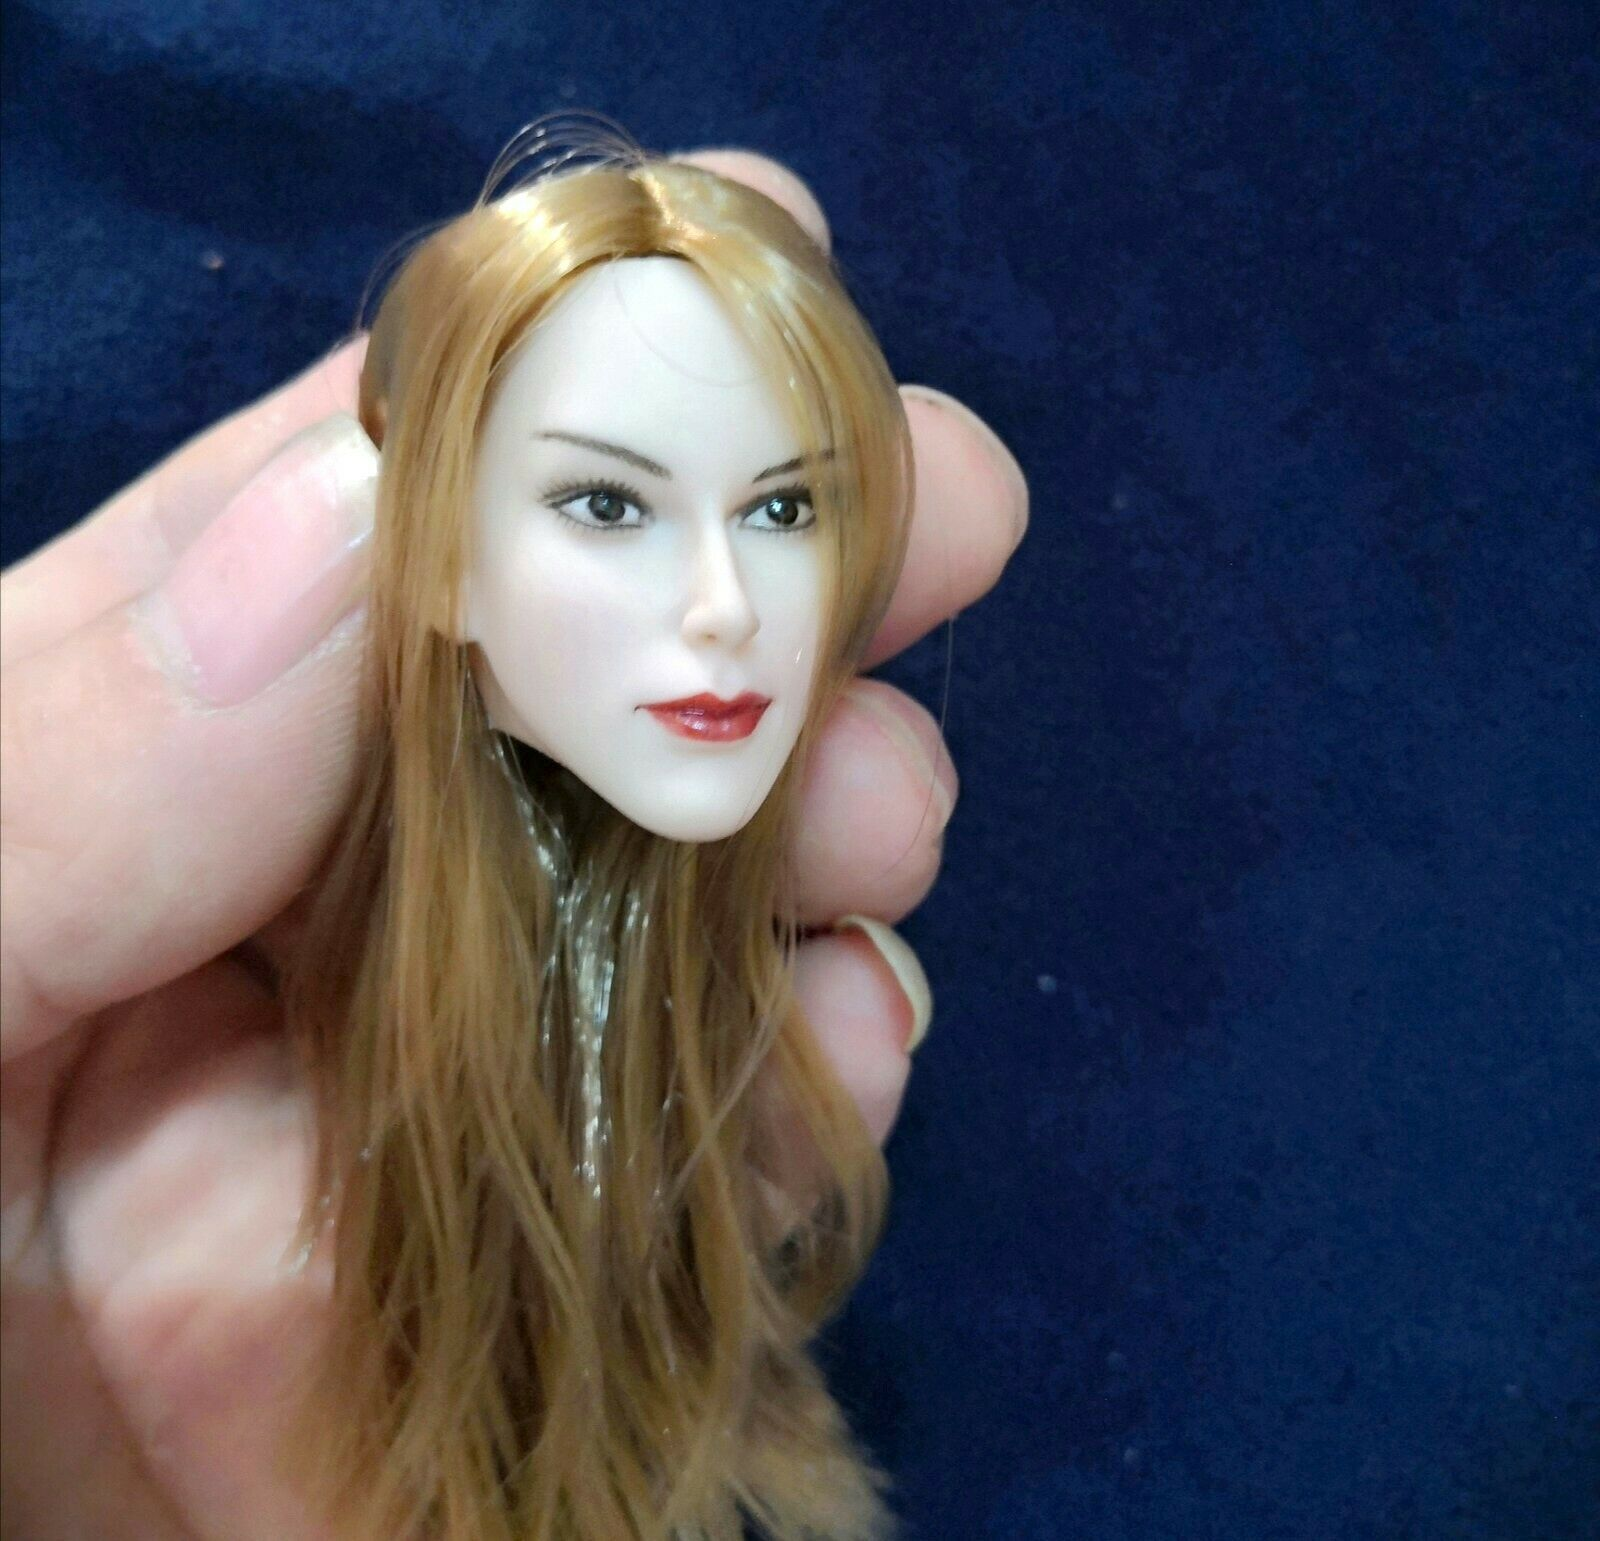 KUMIK 1//6 Scale Figure Doll Female Head Sculpts Carving Girl Long Hair KM 13-10